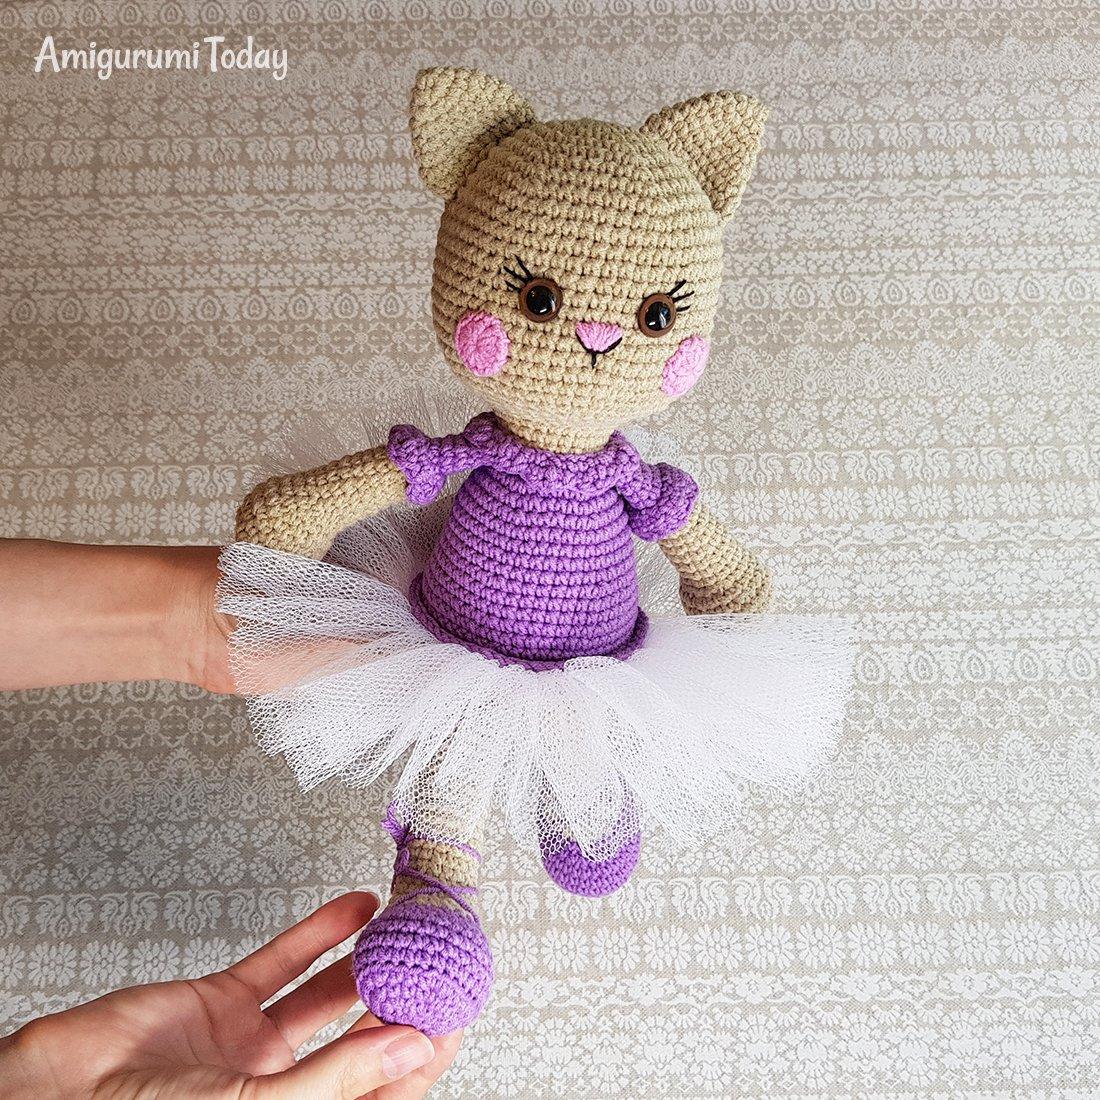 Amigurumi Cat Doll Crochet Free Patterns - Crochet & Knitting | 1100x1100